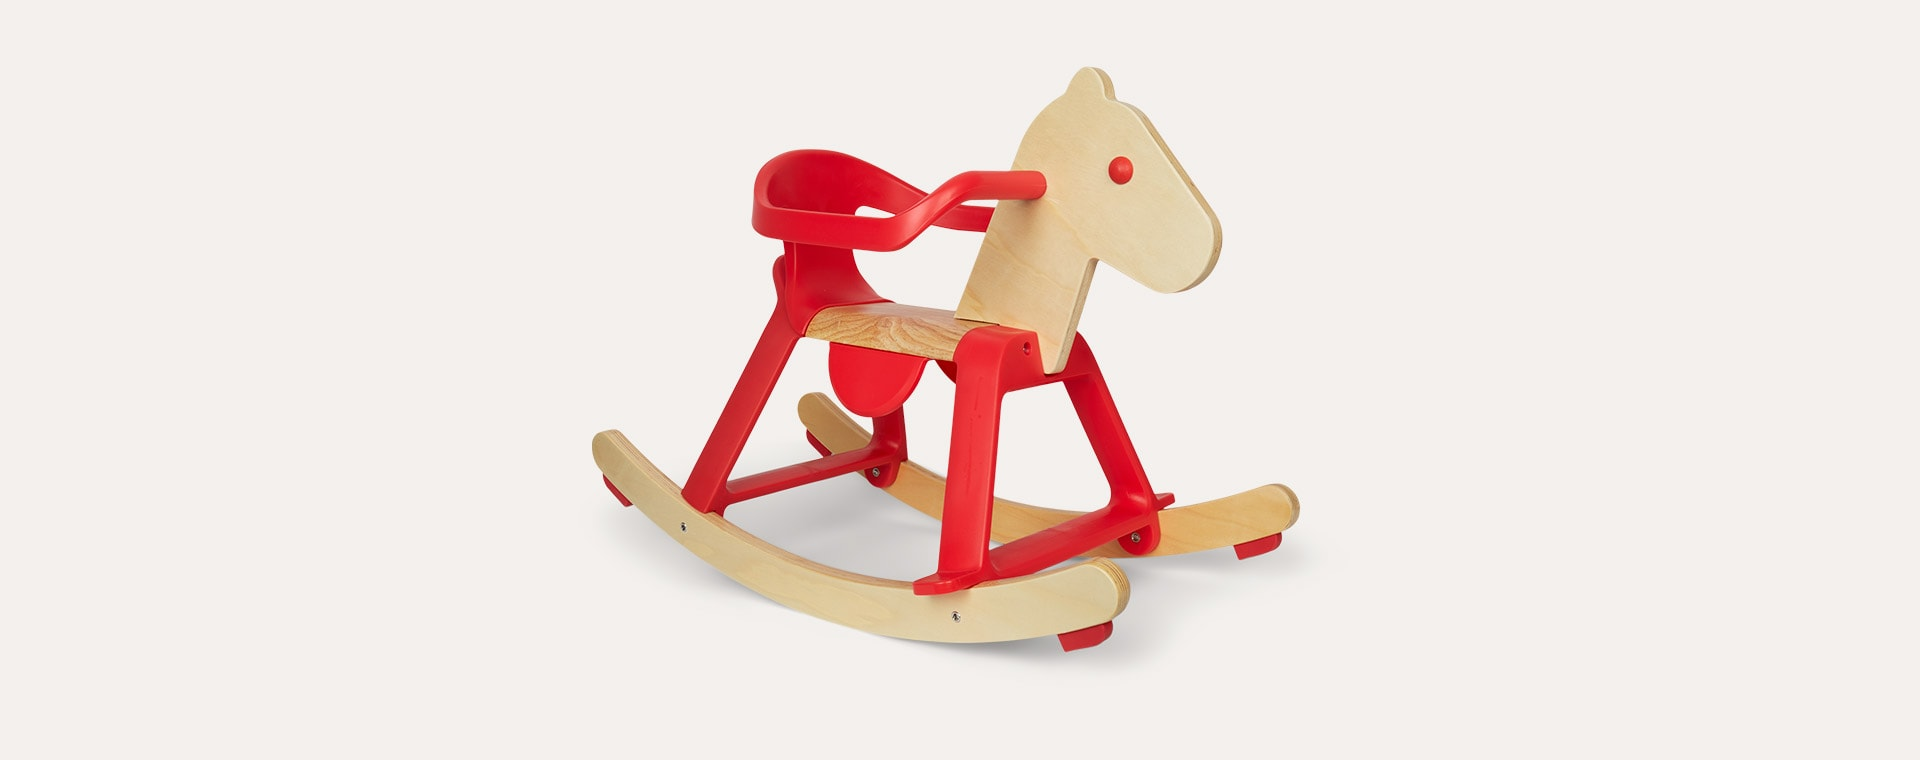 Red Djeco Rocking Horse